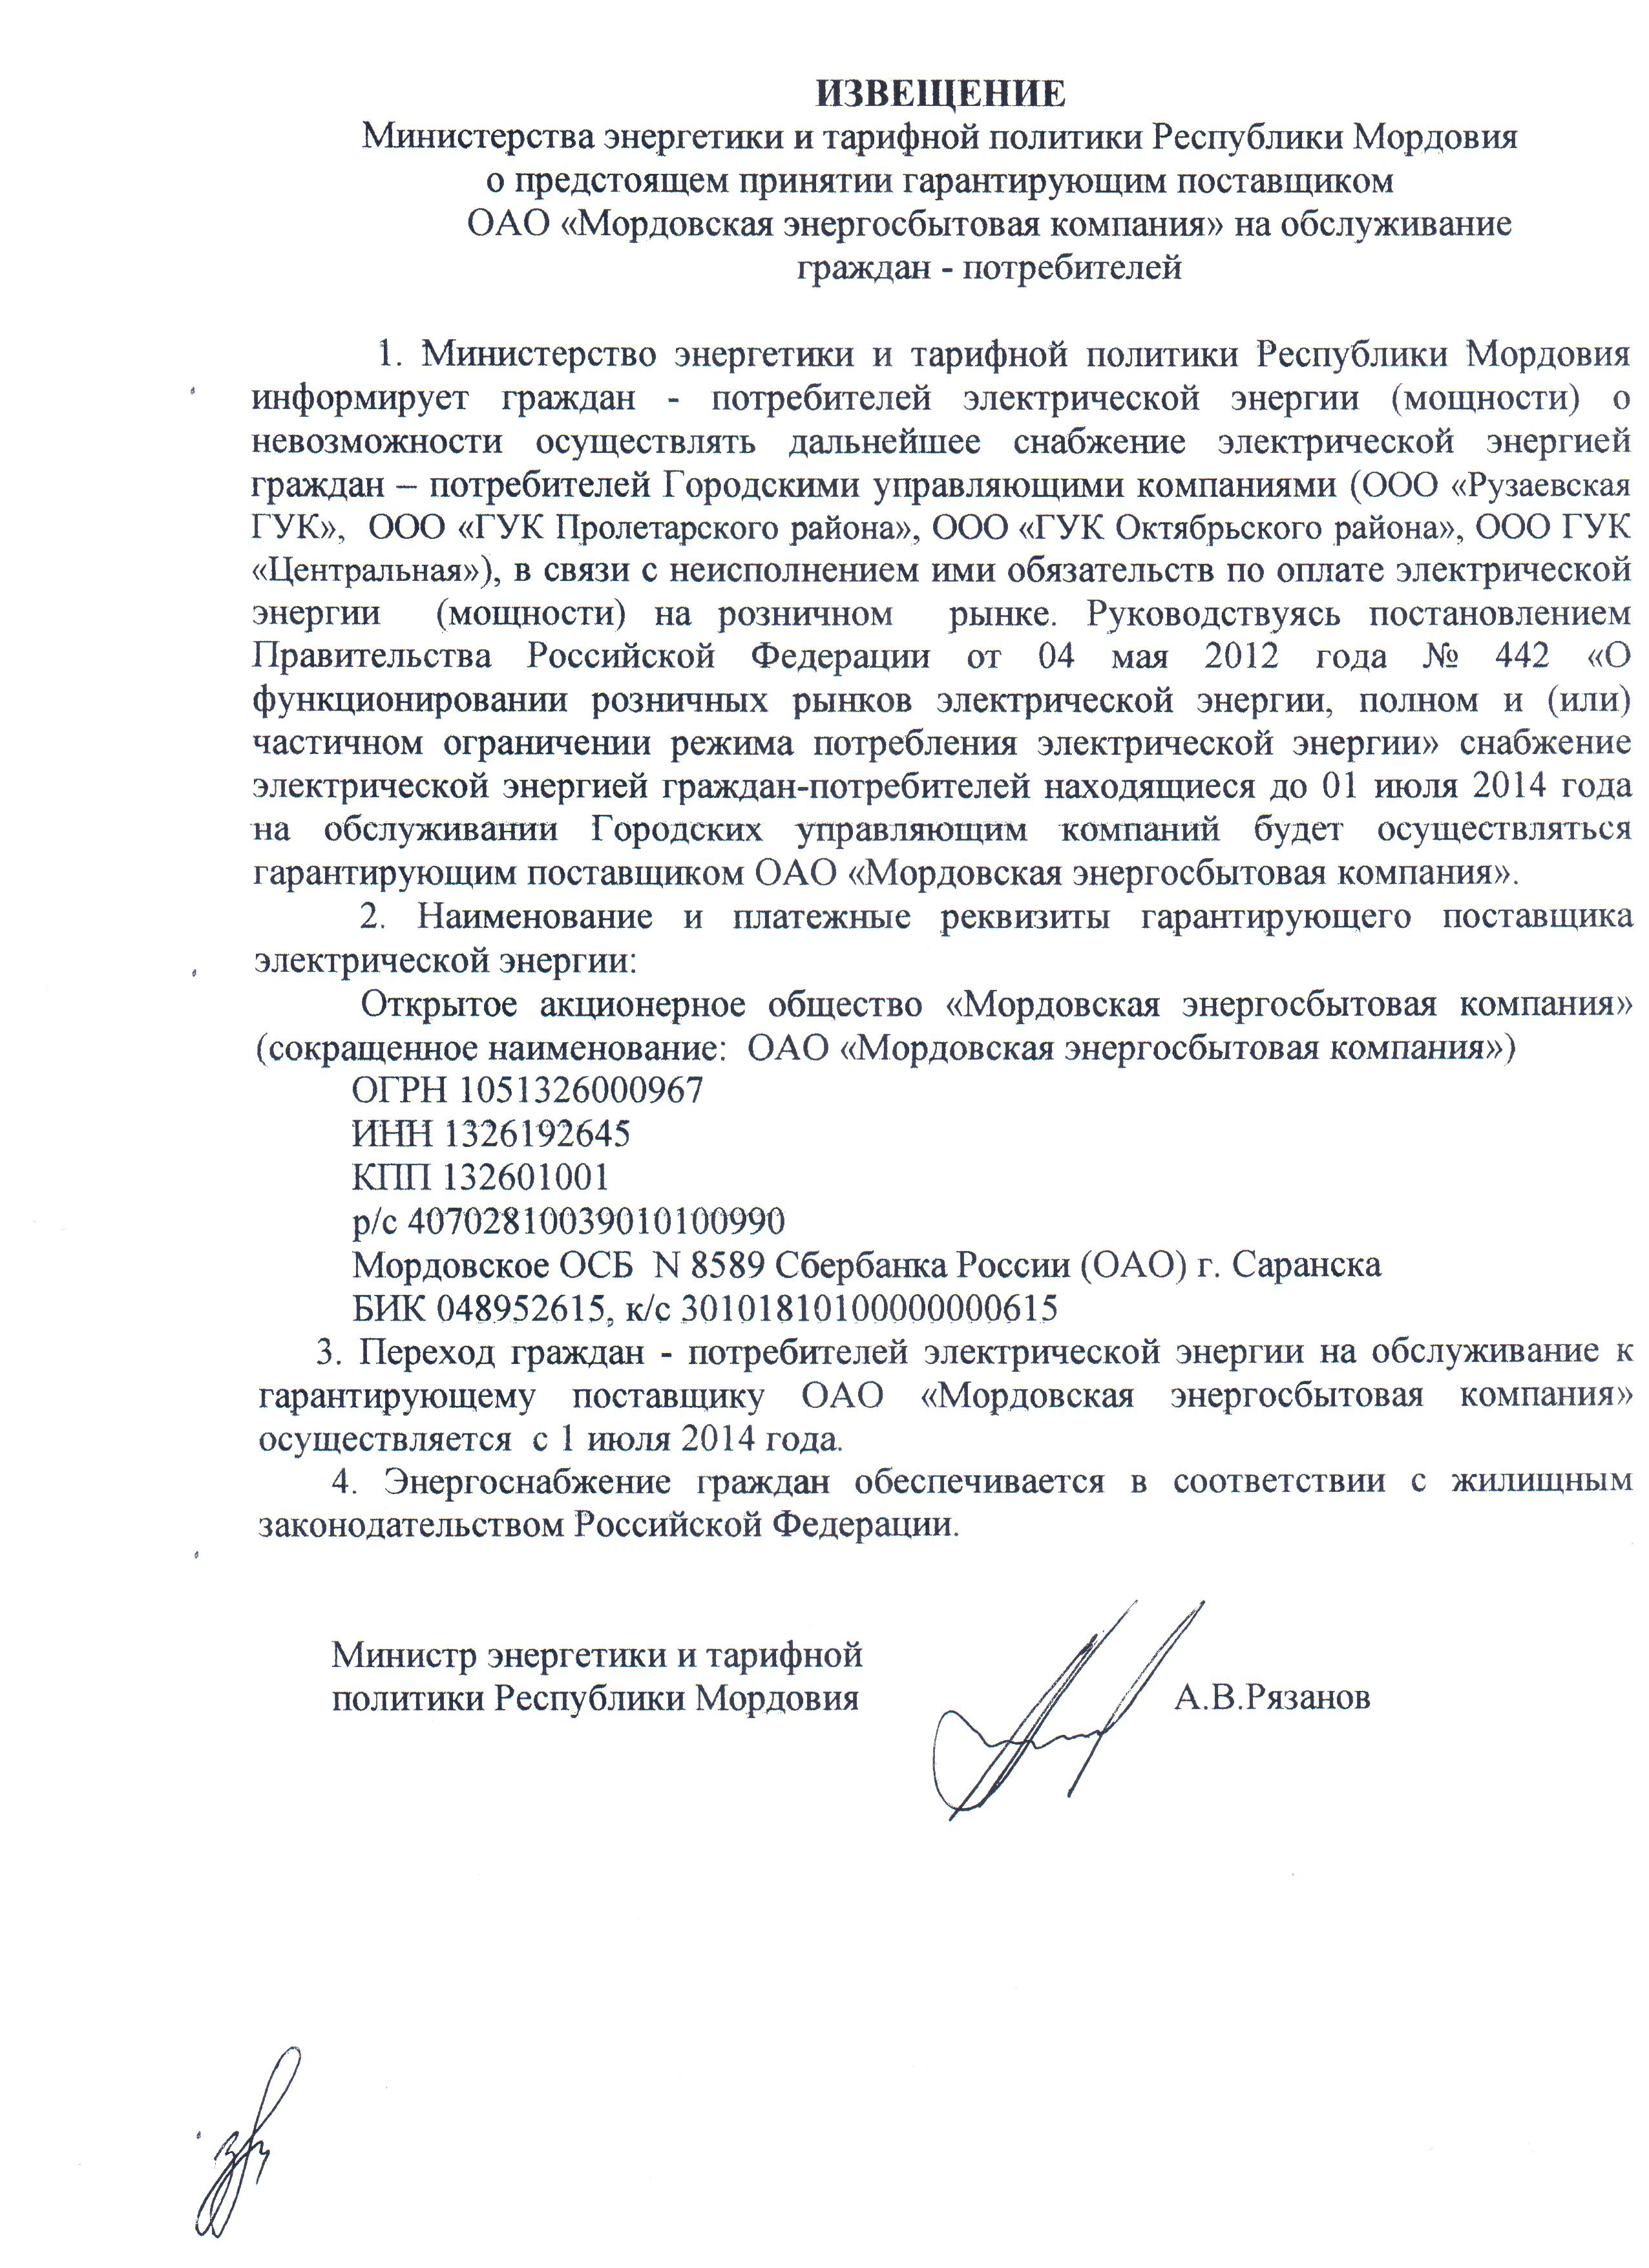 9 приказ мвд россии от 15 марта 2005 015 инструкция по обеспечен